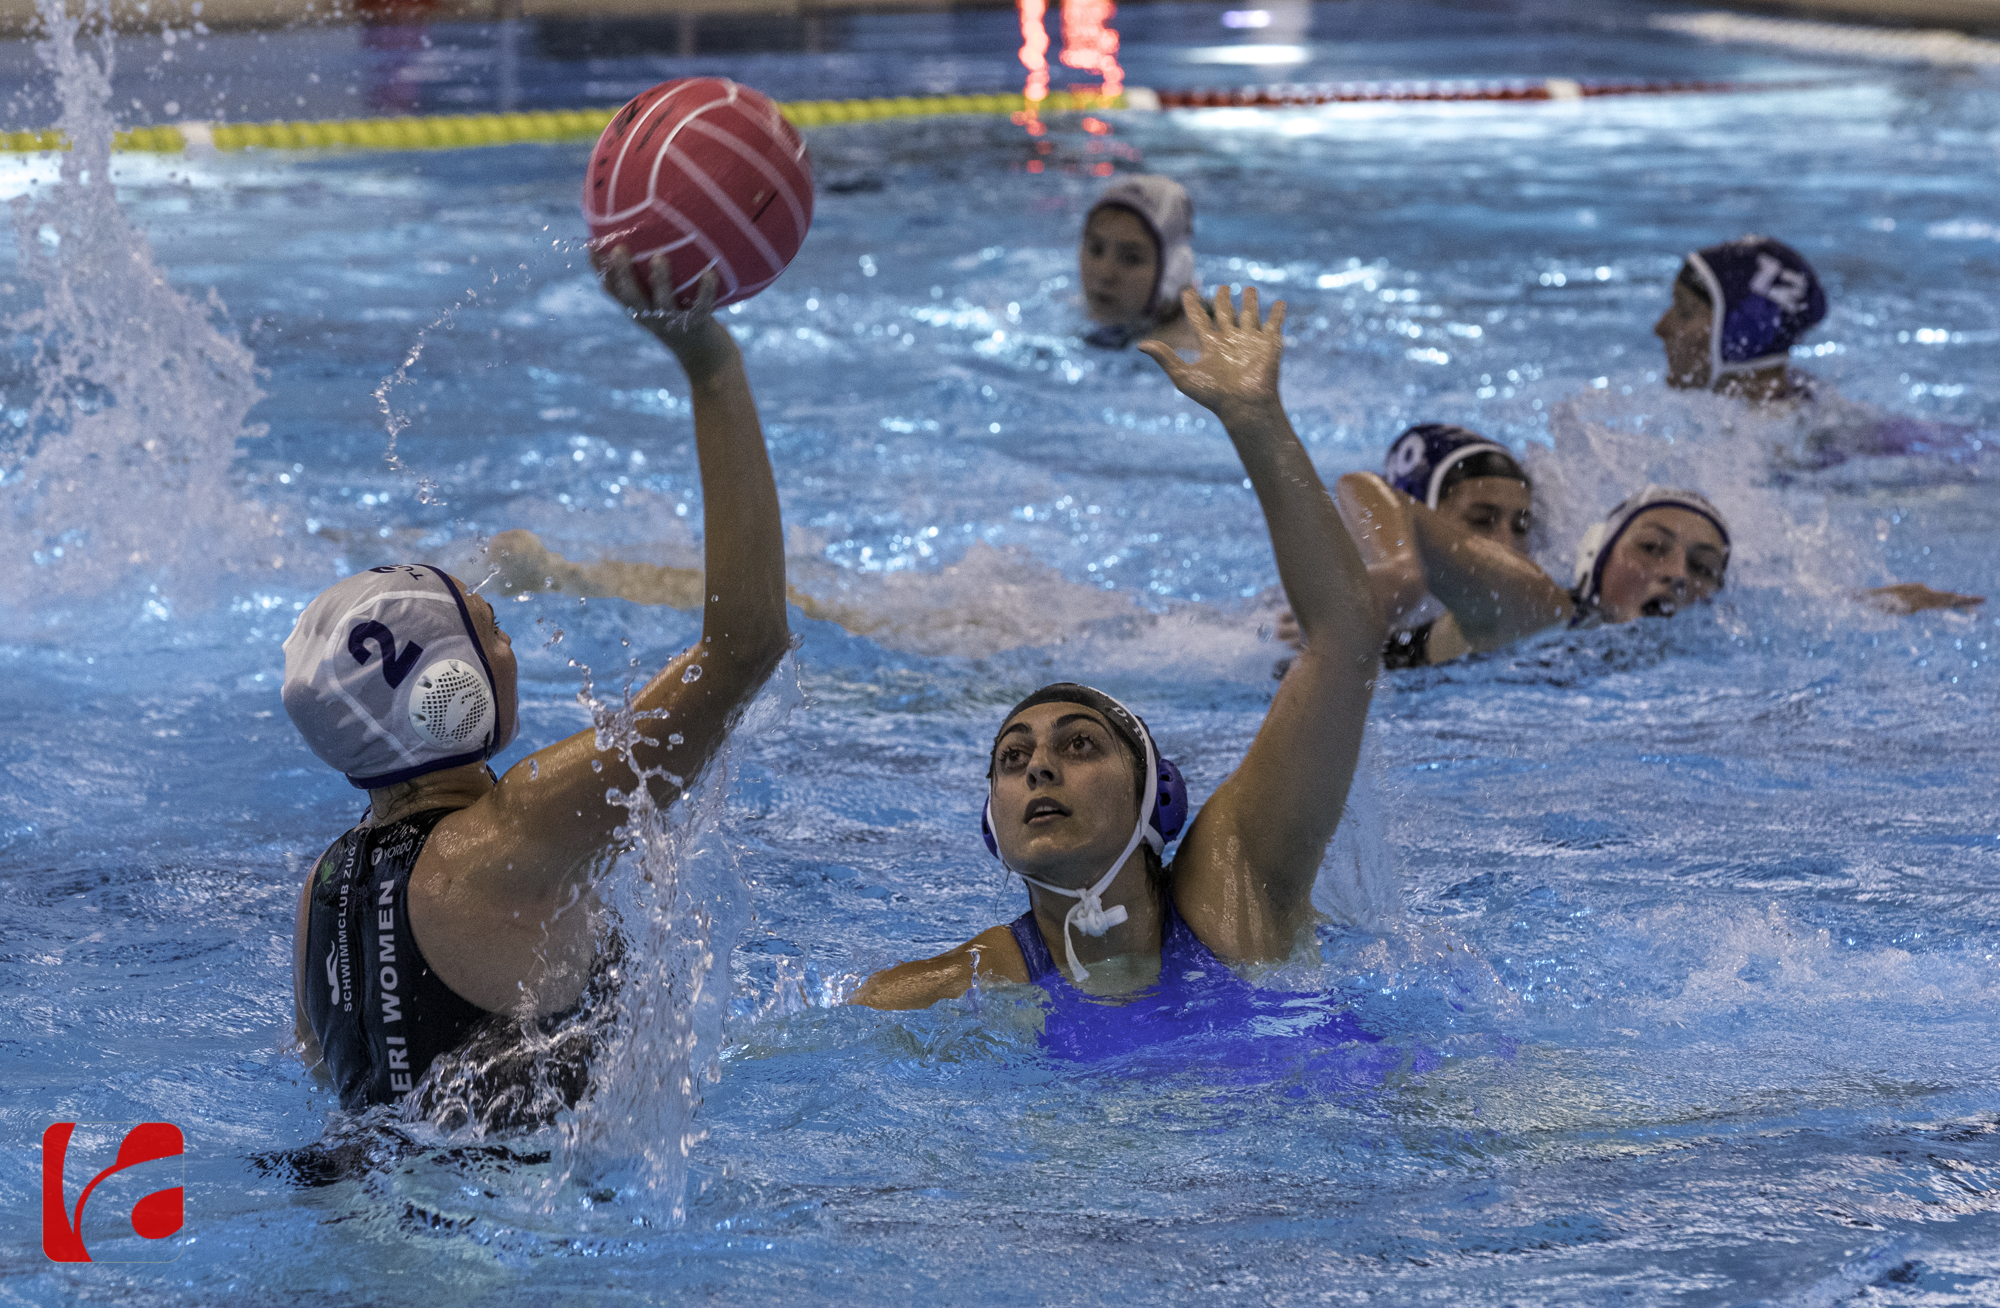 NLD Saison 2020/21: SC Zug Women - WBK SM Zürich Women